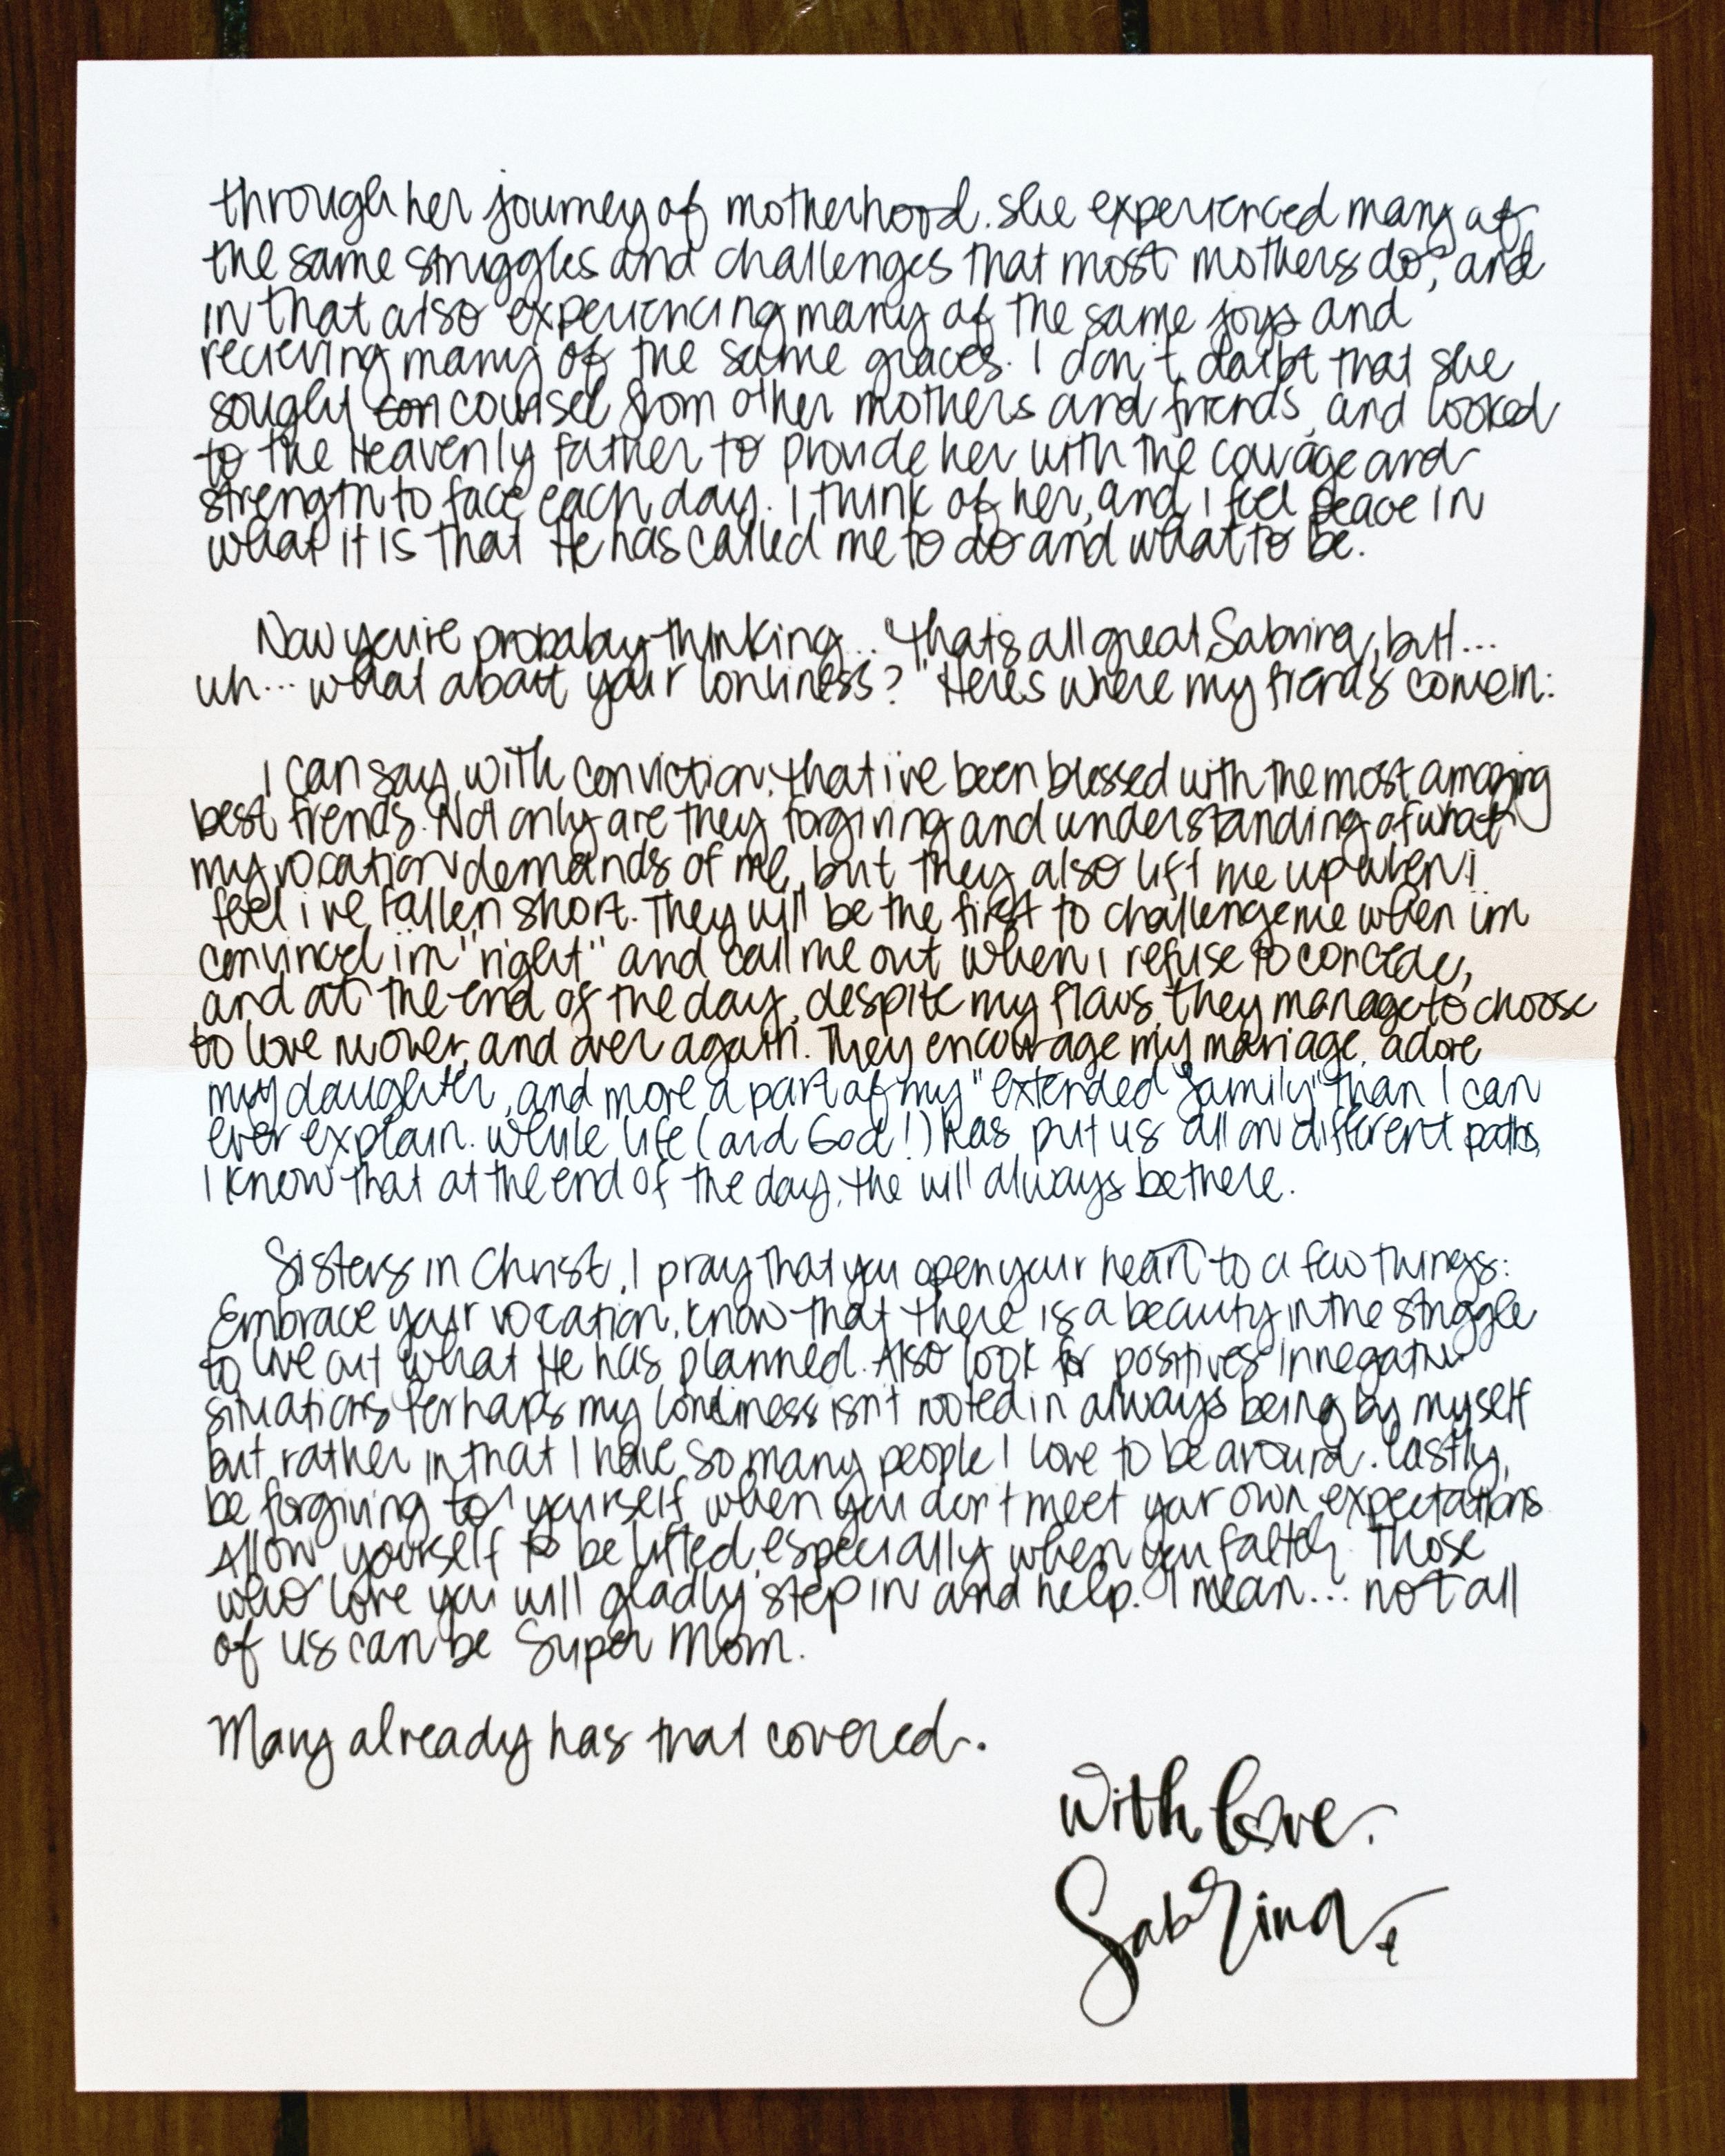 Sabrina Cerdenola Letter to Women the Catholic Woman 2